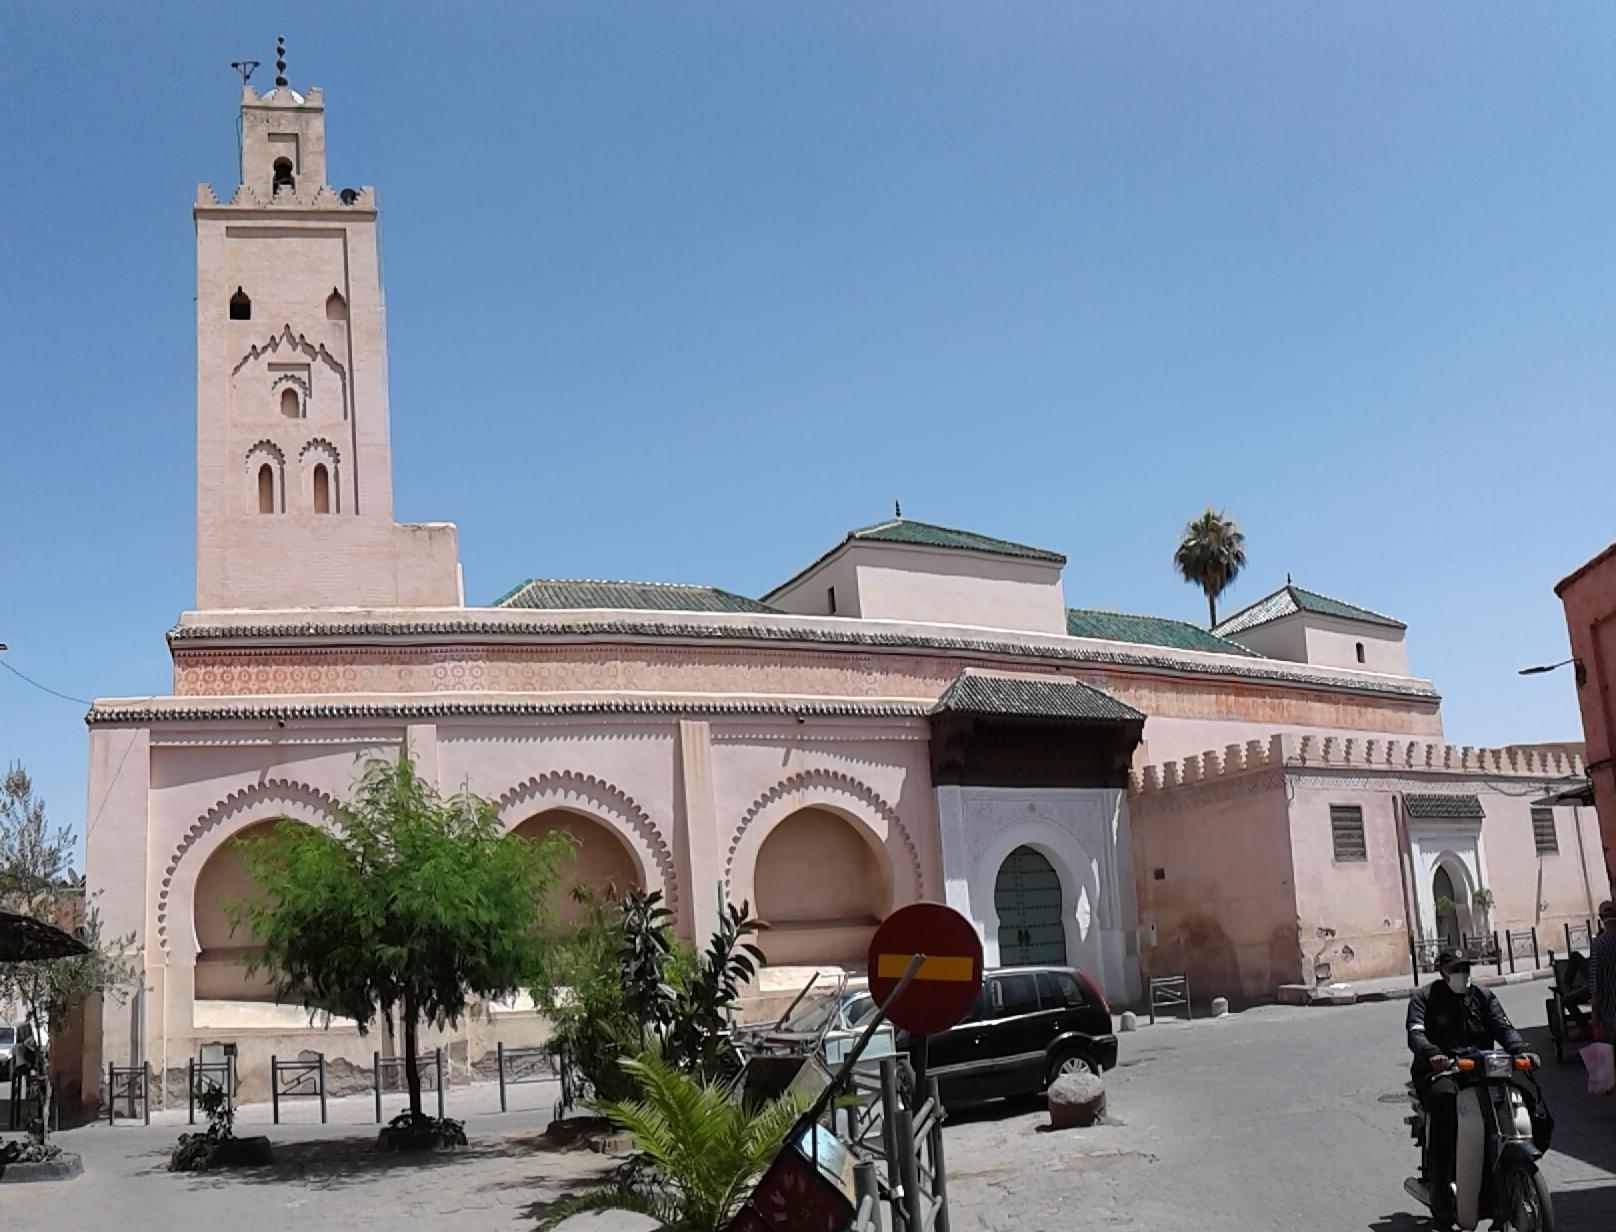 mosquee Saadienne bab doukkala marrakech